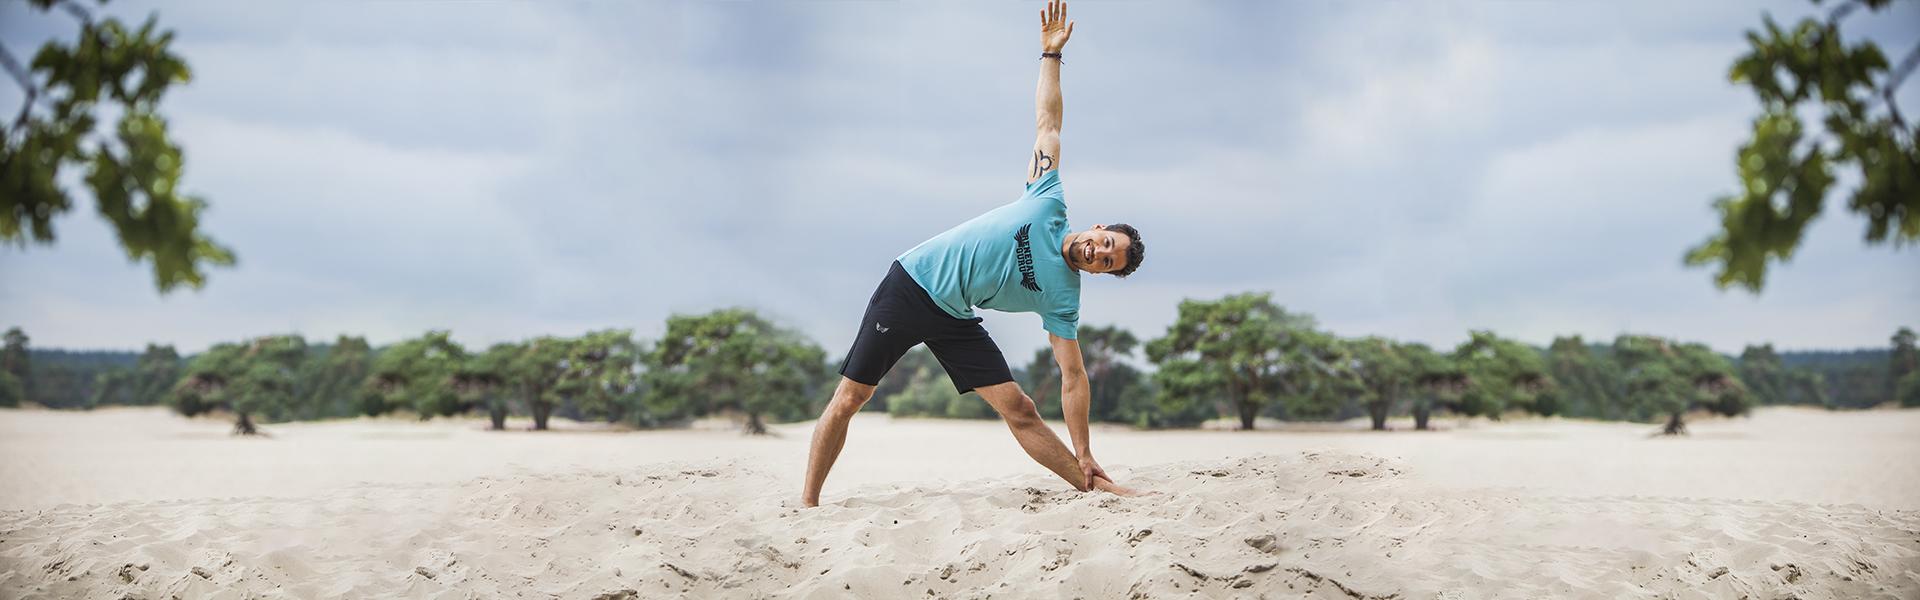 Banner RG 2018 - Bodhi yoga shorts met de Moksha yoga tee